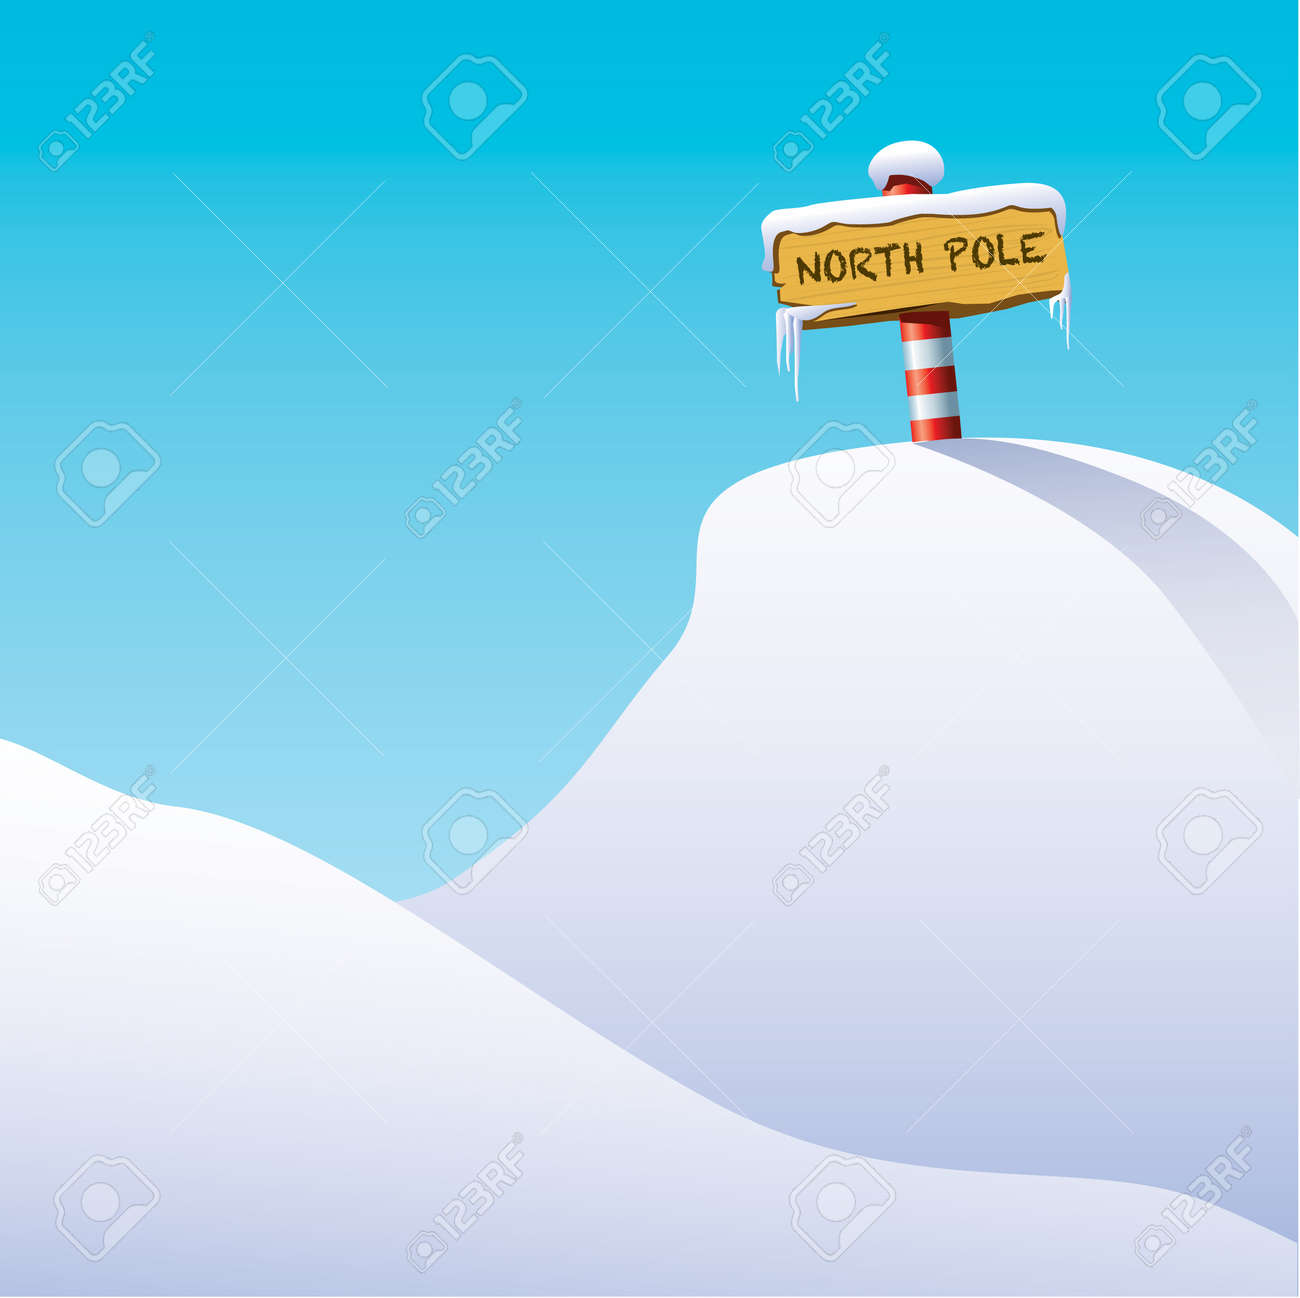 North Pole Stock Vector - 8471683